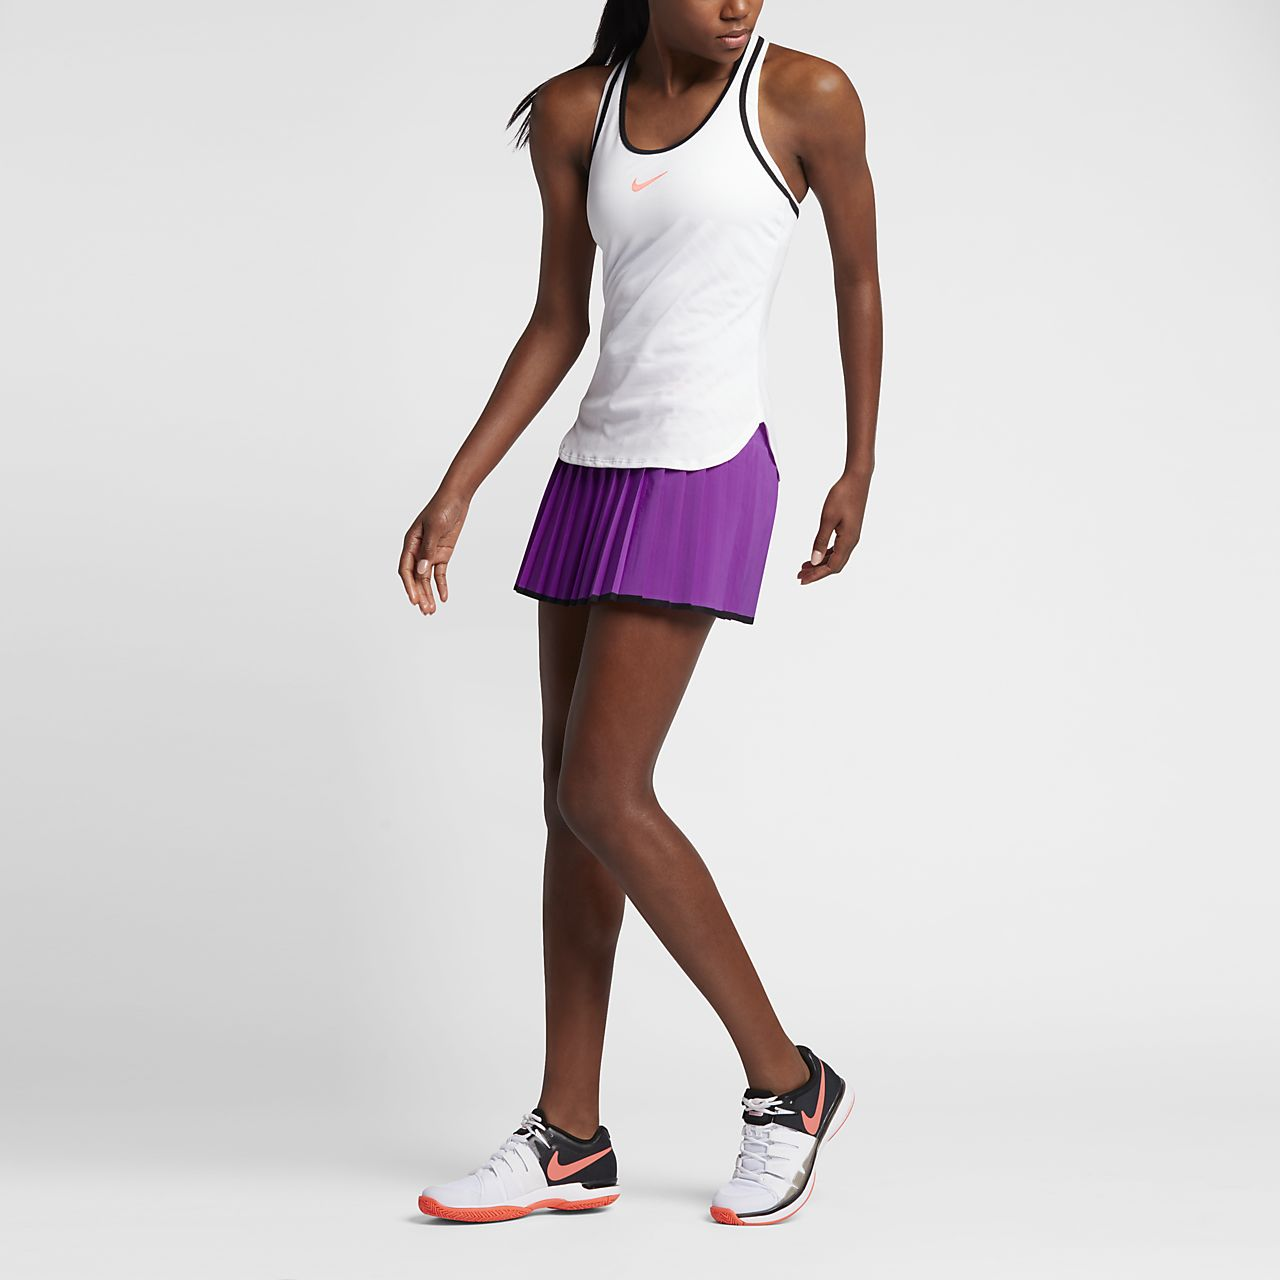 nike football jerseys cheap nike tennis skirts nz